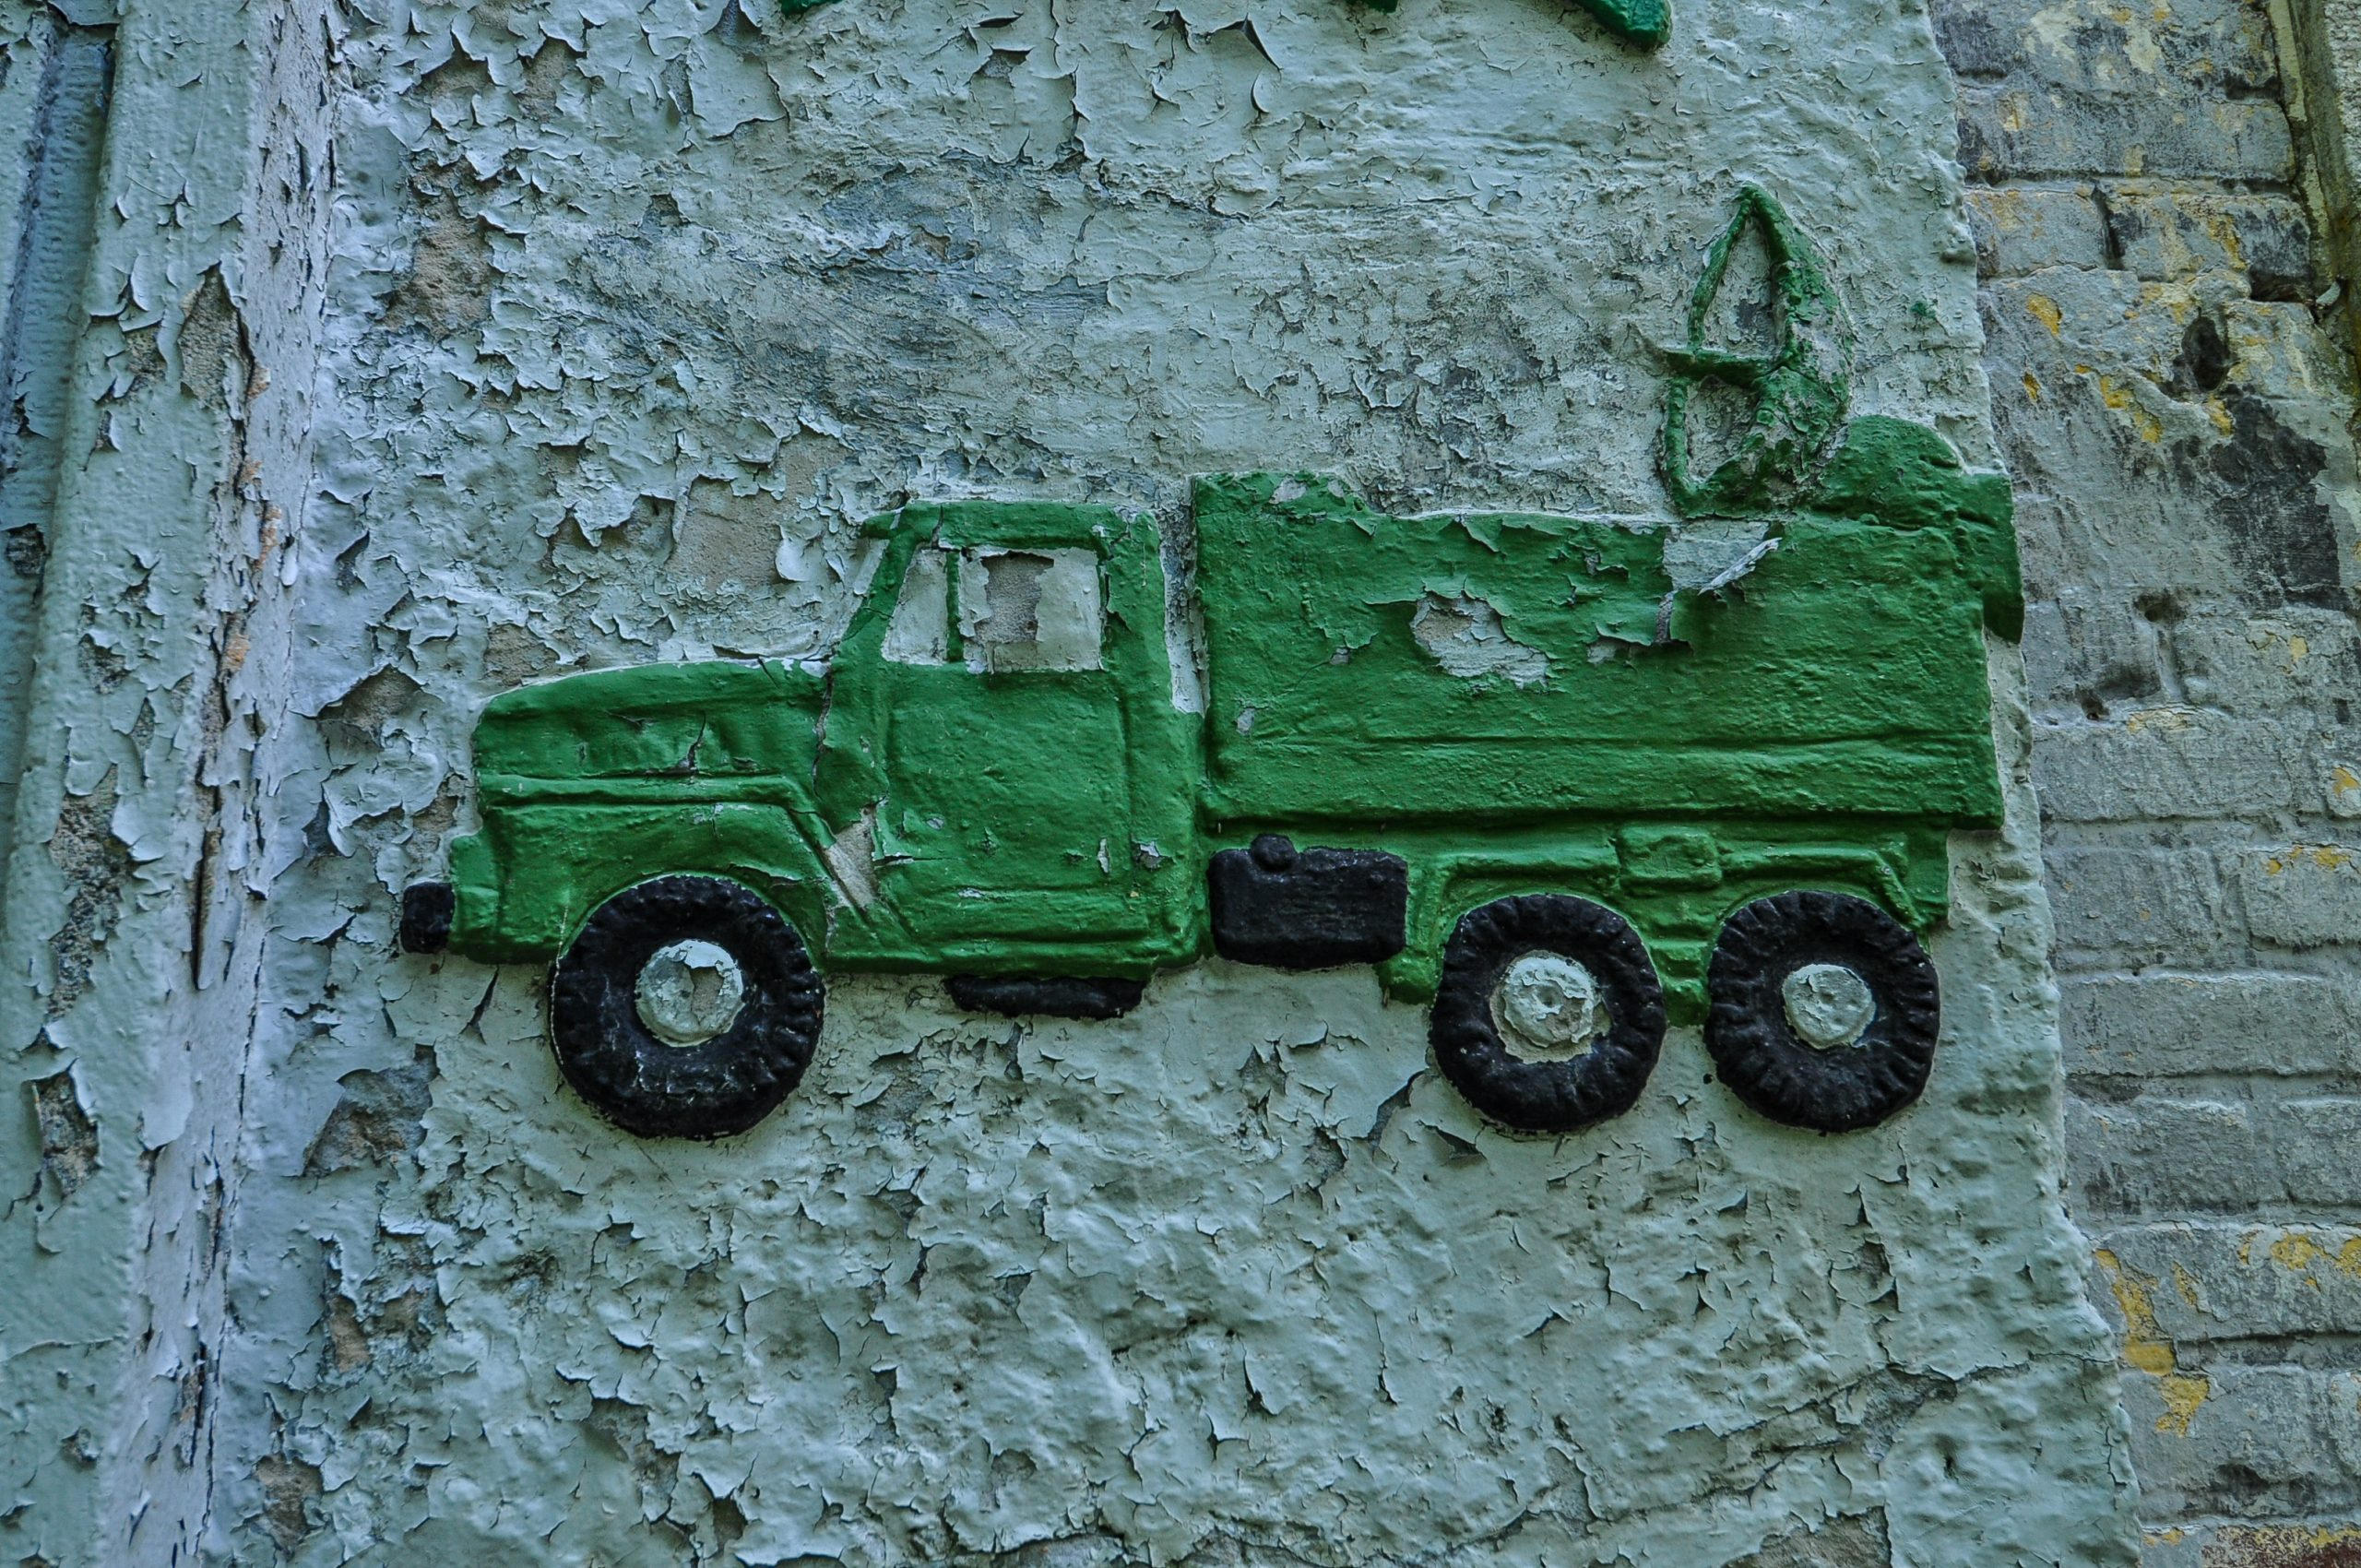 soviet radio truck mural door kaserne krampnitz abandoned potsdam berlin Kavallerieschule barracks Panzertruppenschule nazi soviet military base germany deutschland